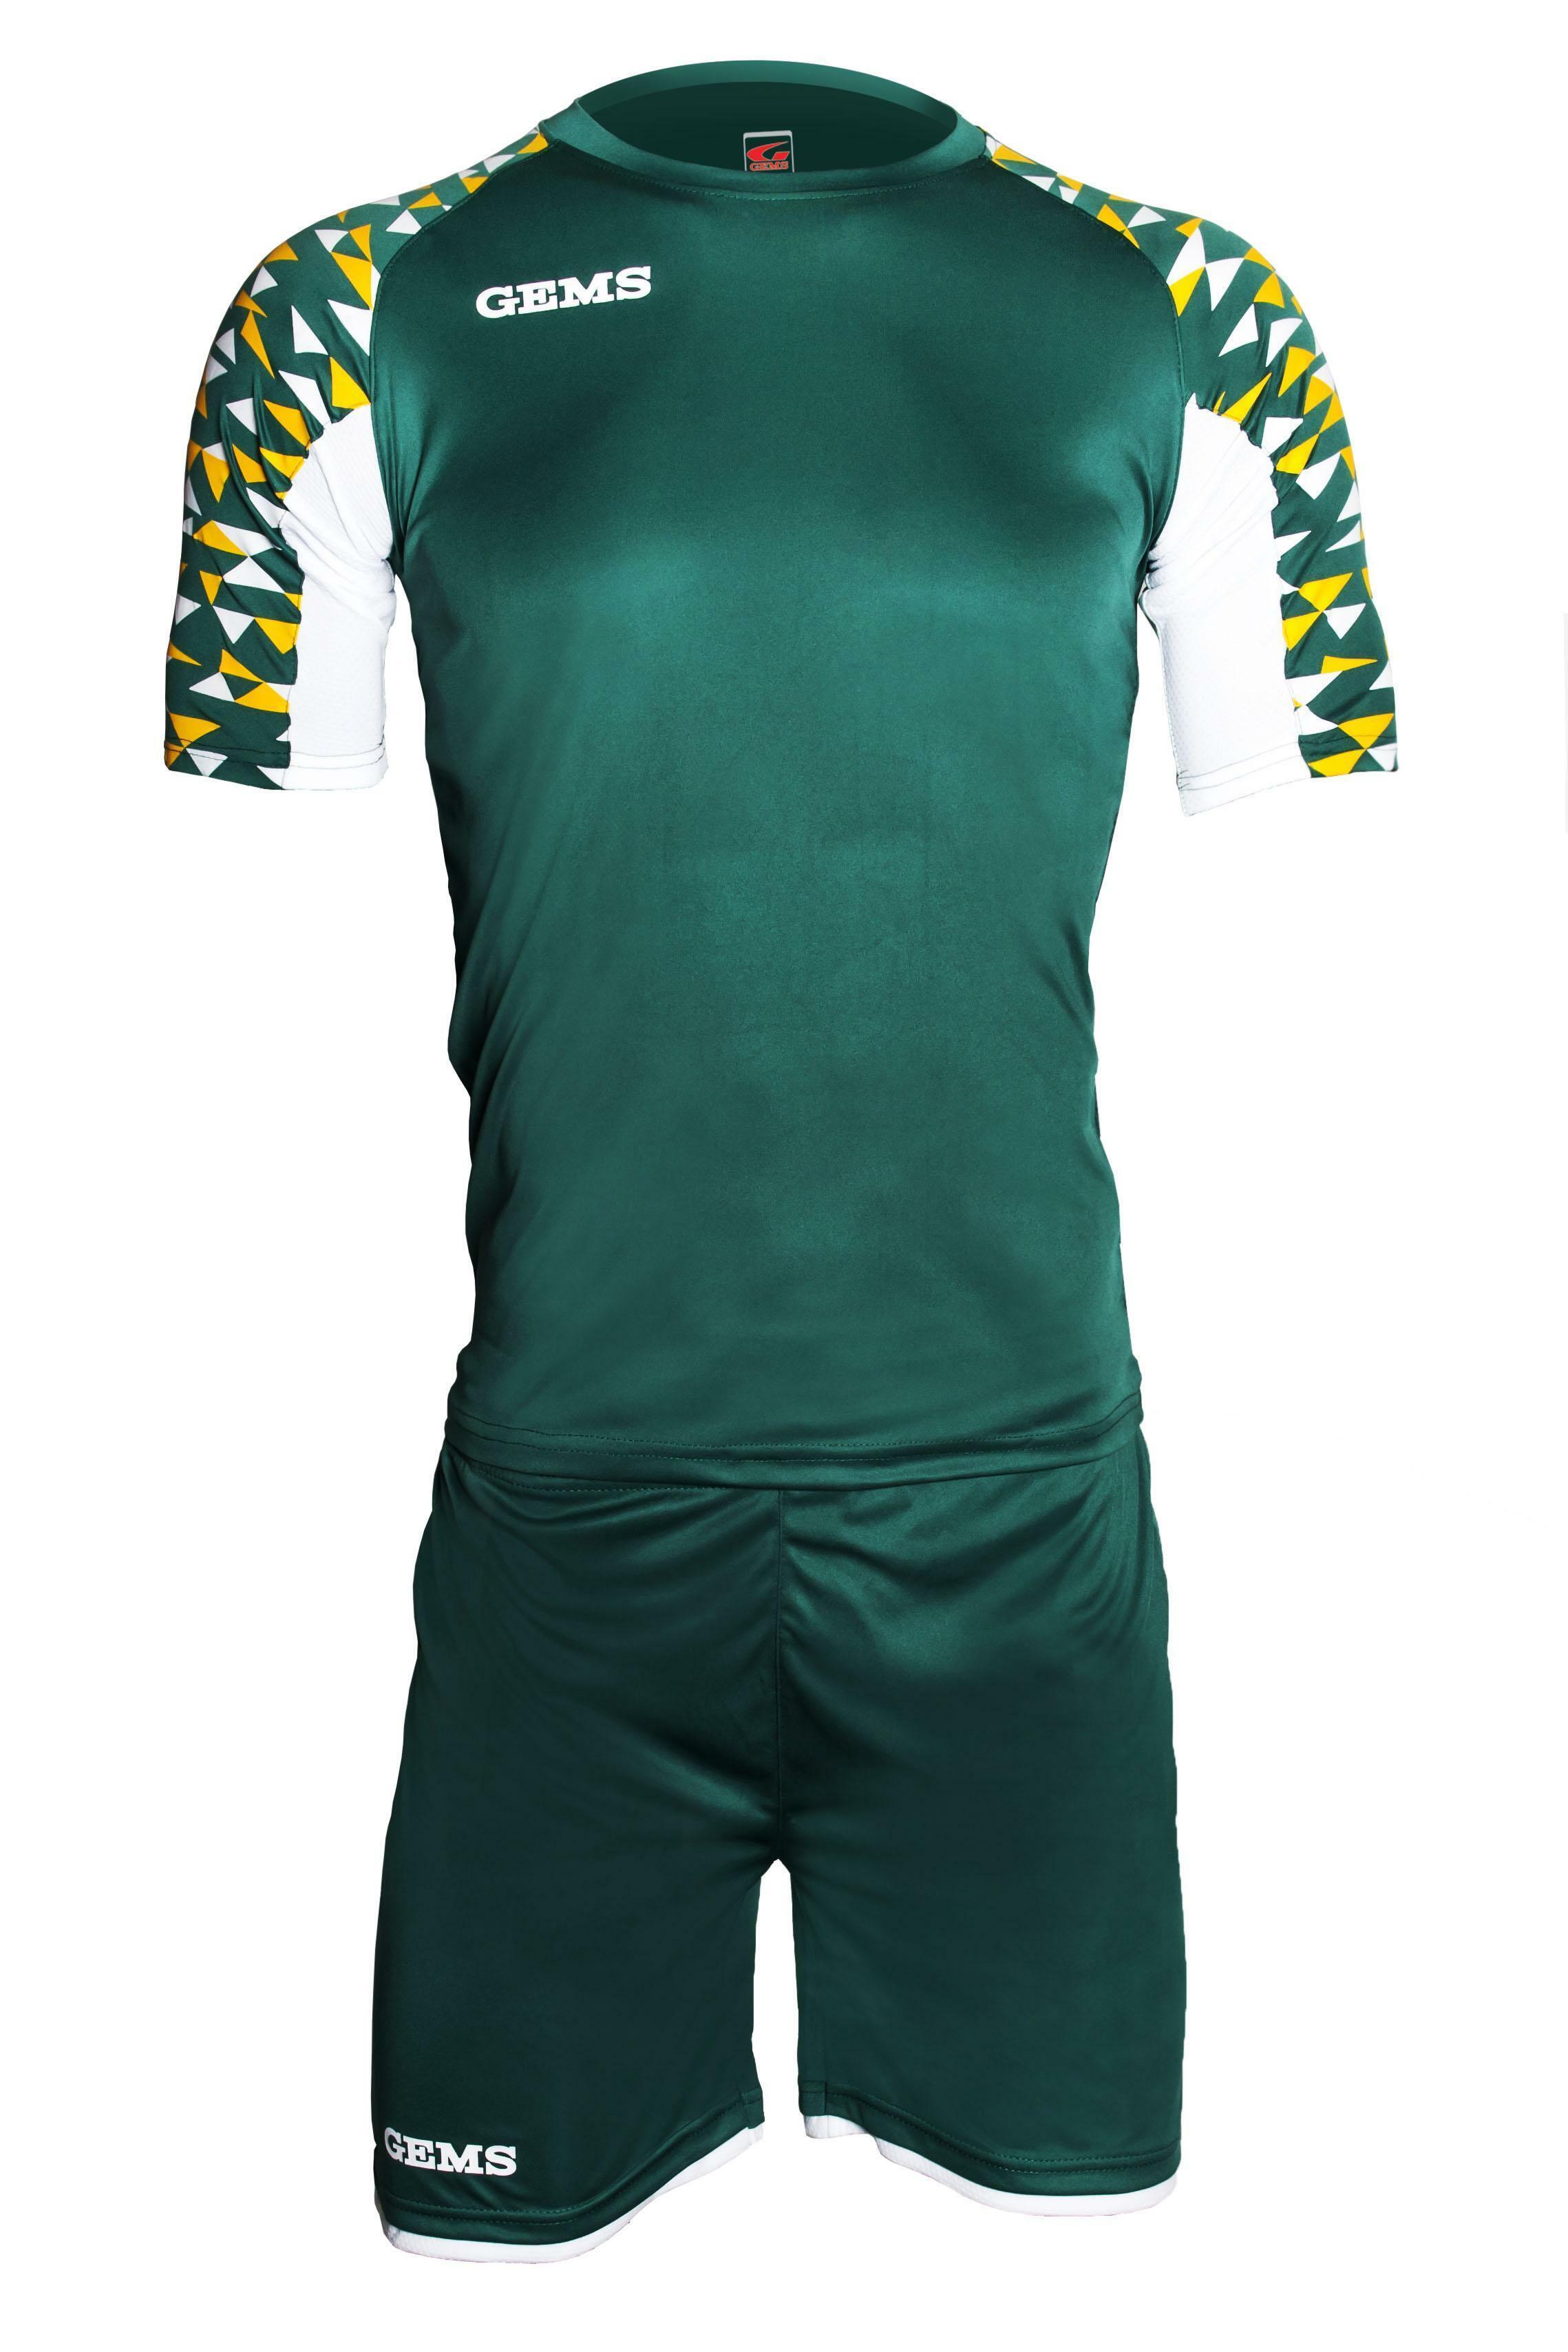 gems gems kit calcio west ham verde/bianco